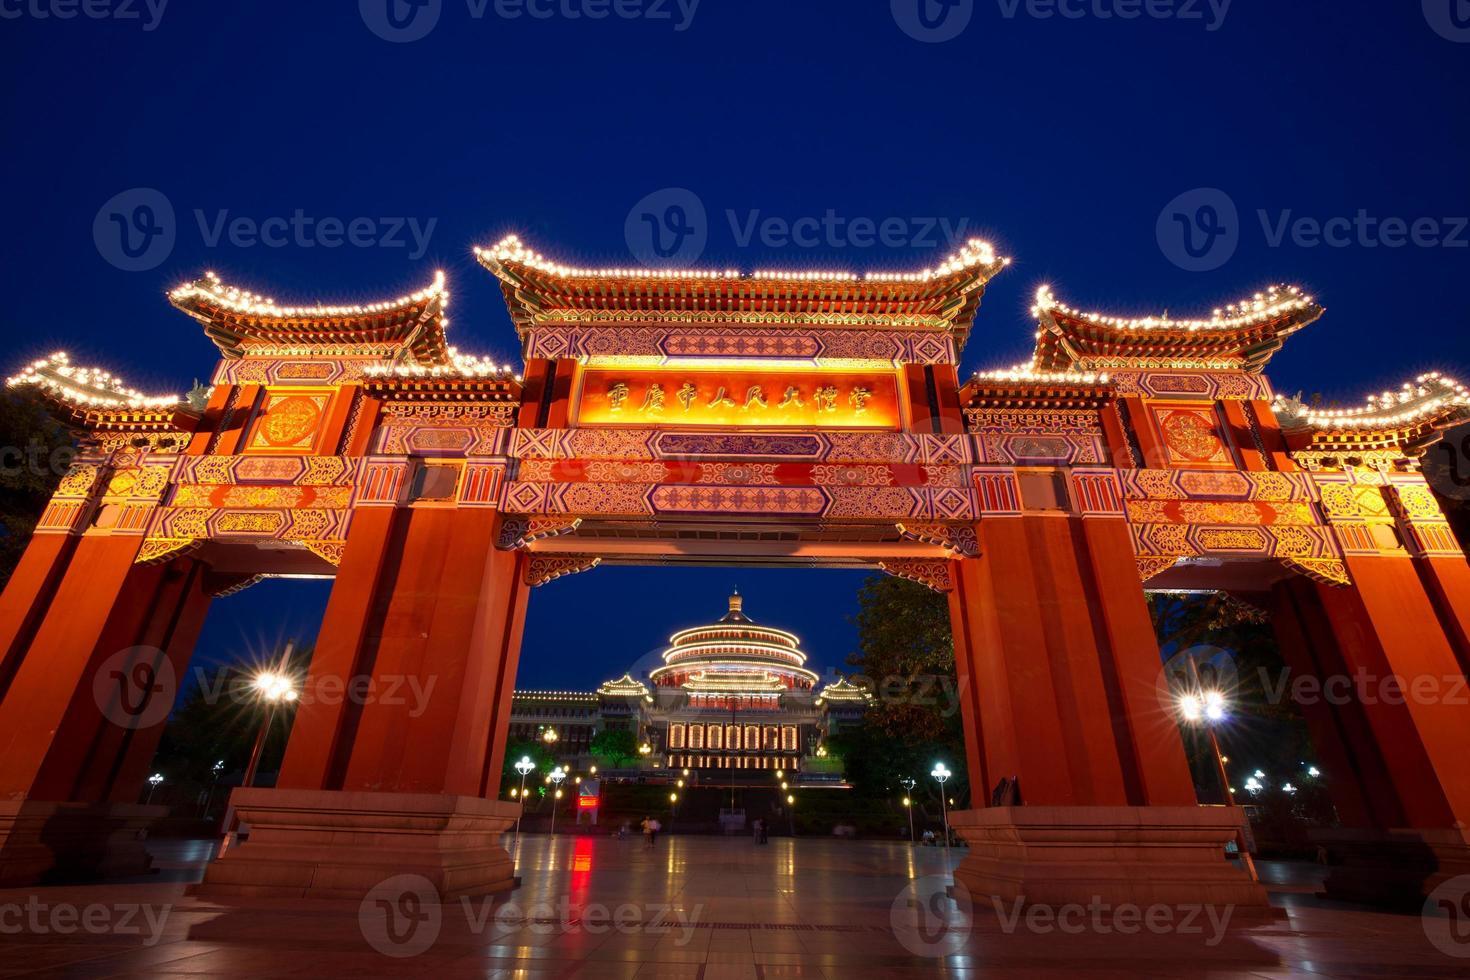 arc porte et grand hall nuit scène, chongqing, chine photo